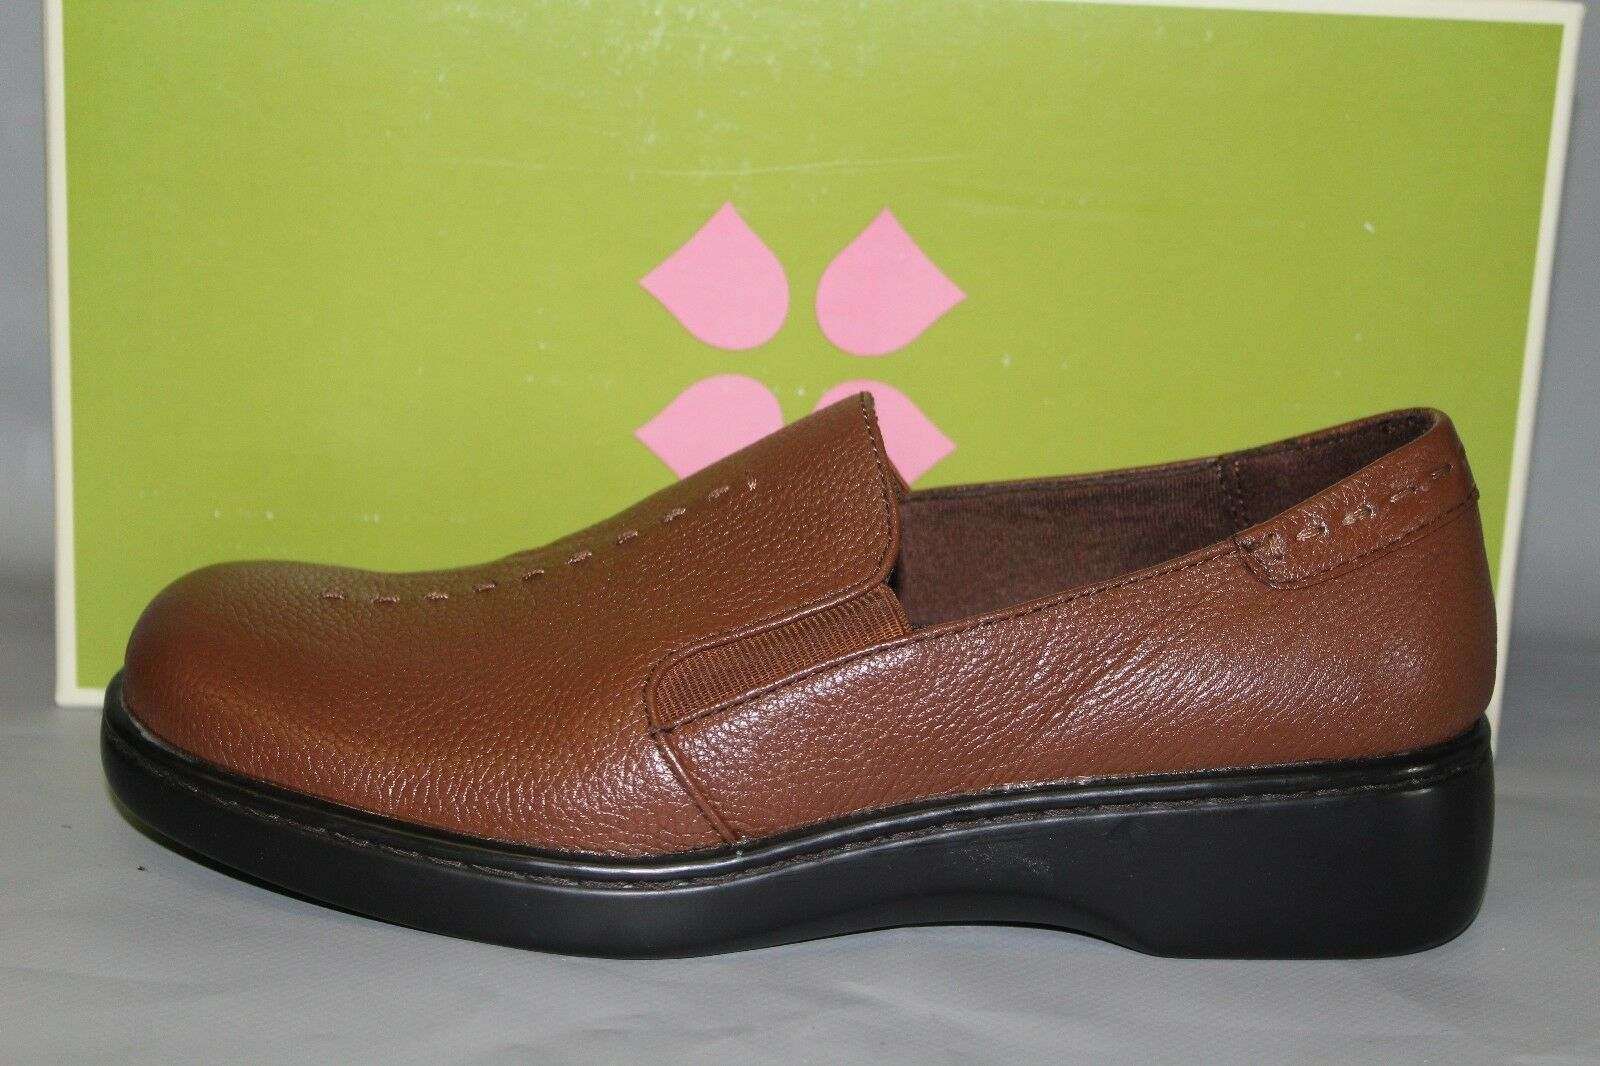 NEU Naturalizer Music Braun Leder Slip on Comfortable Casual Schuhes